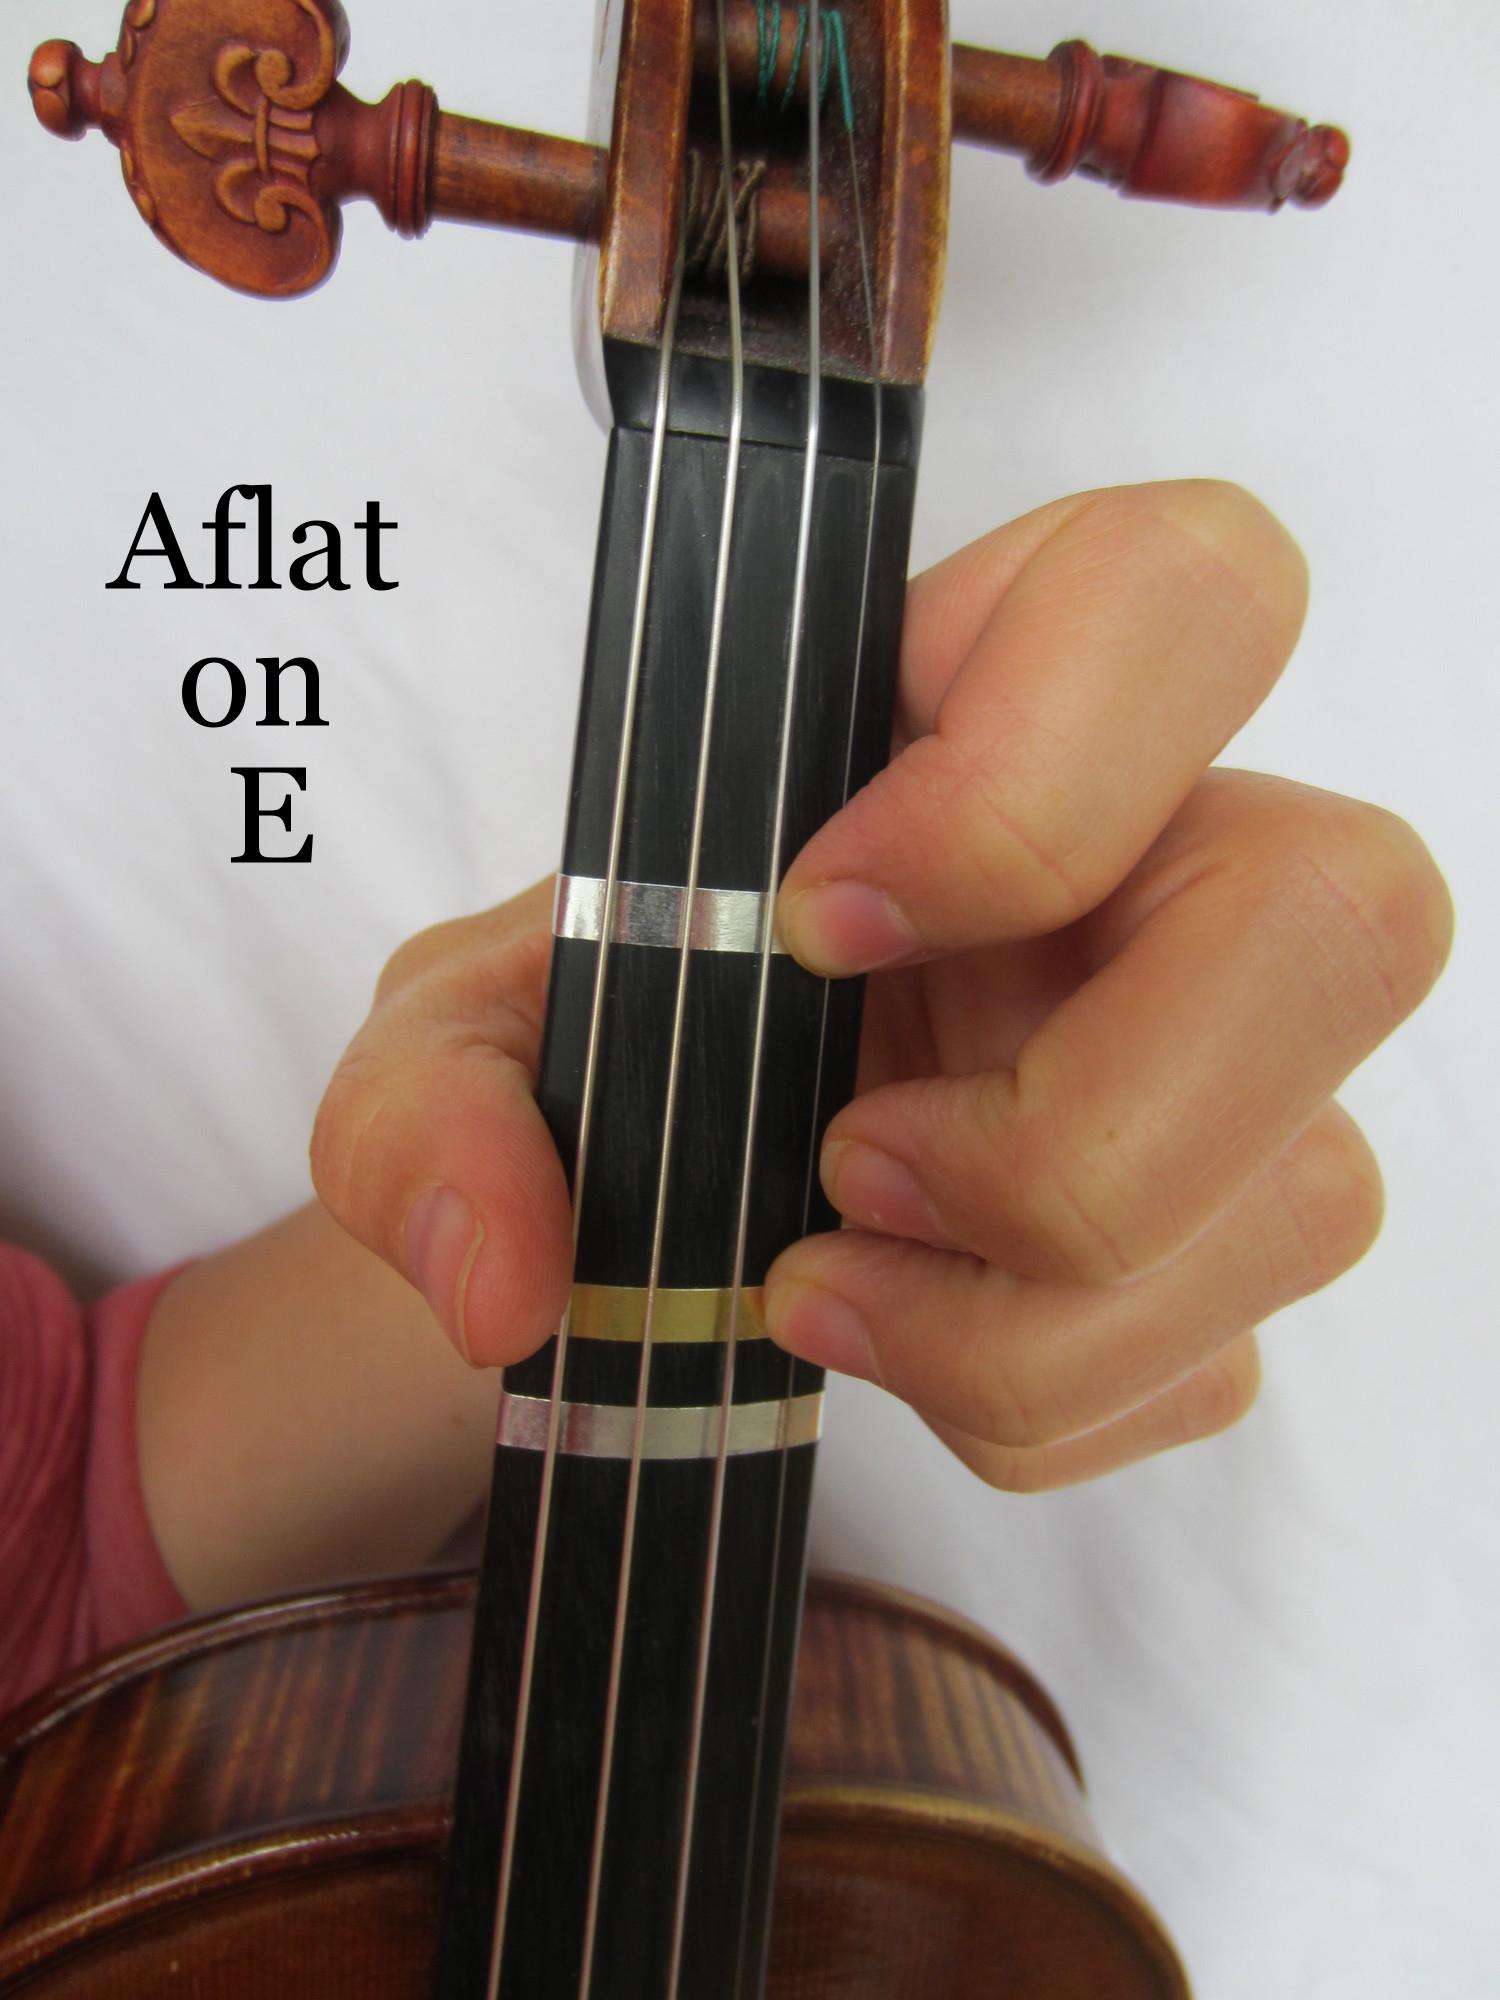 Violin Fingering A flat on E.JPG